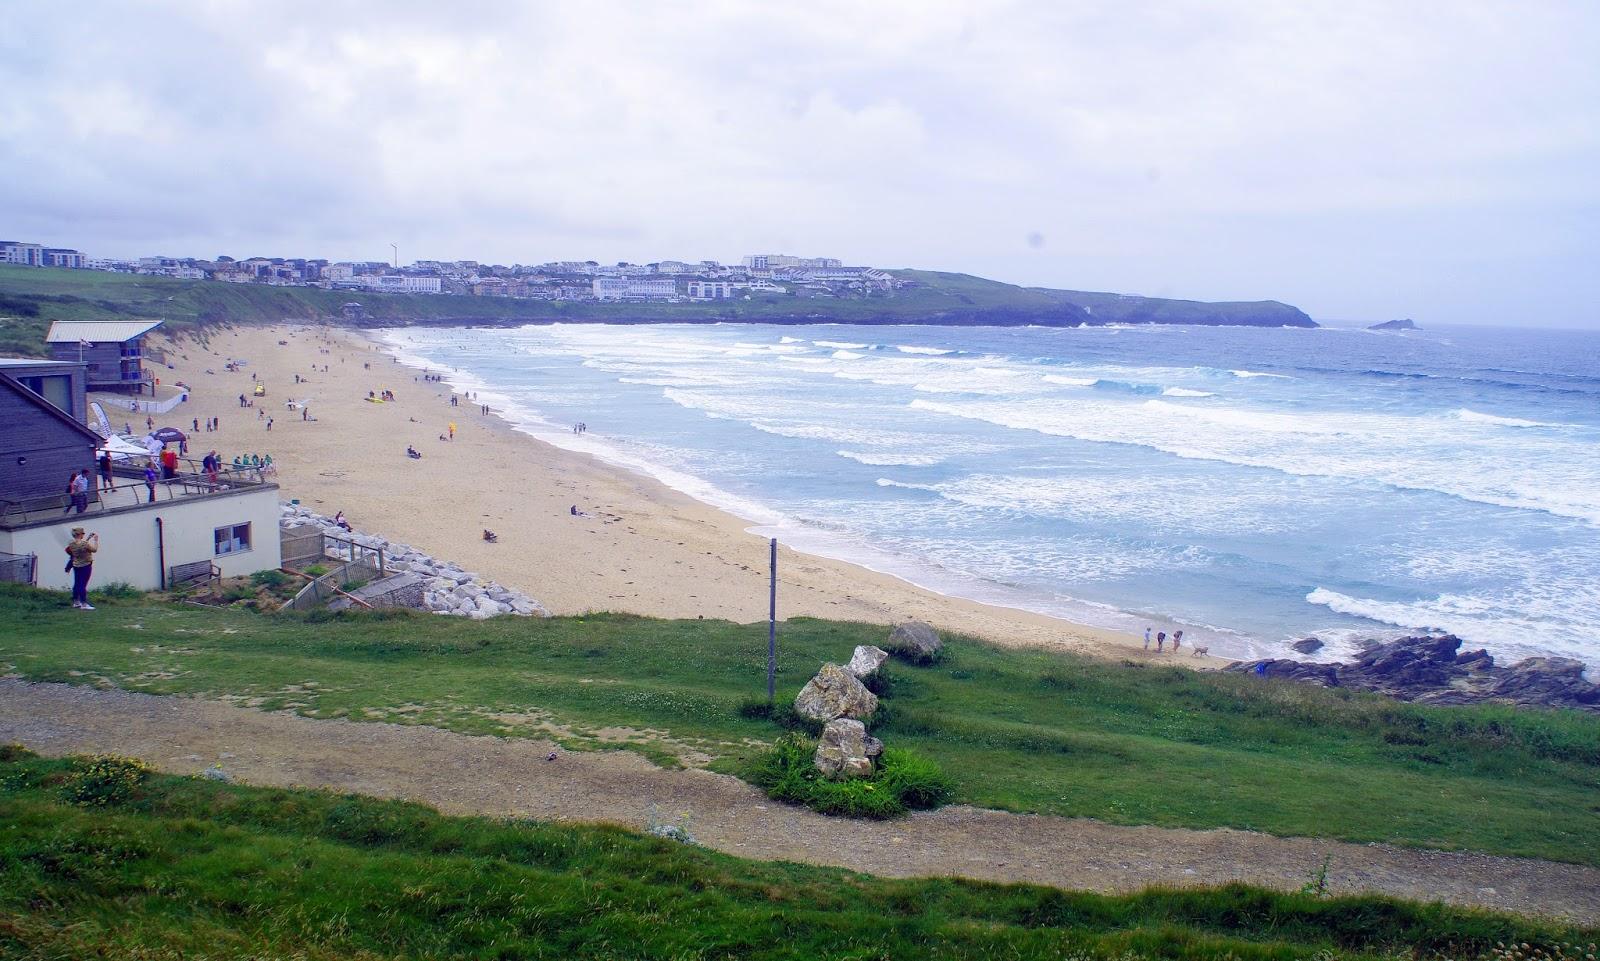 Headland Hotel Newquay Cornwall Fistral Beach View